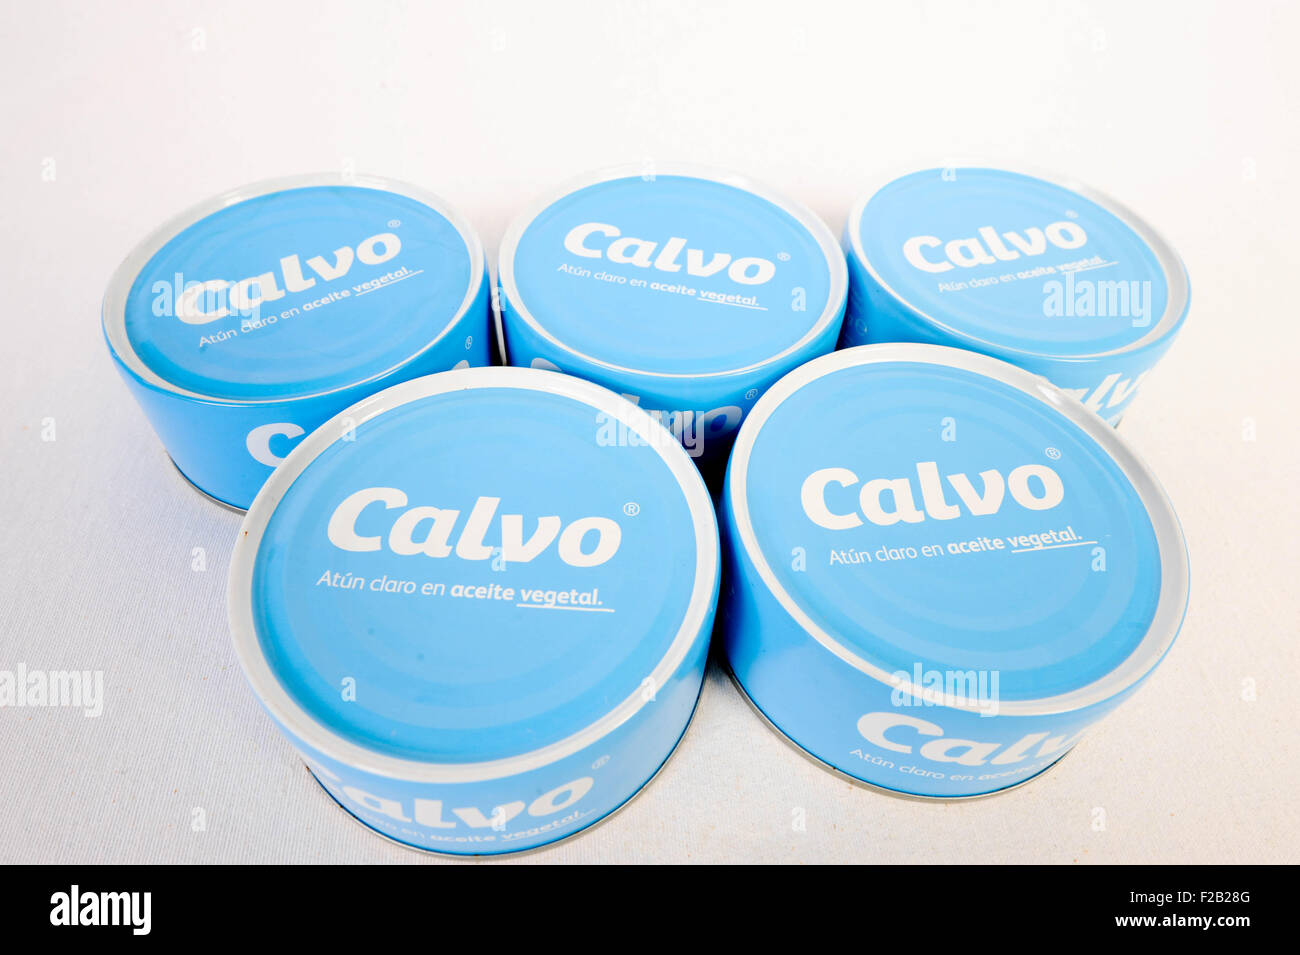 Array of tuna, Calvo - serie de atún, clavo - Stock Image